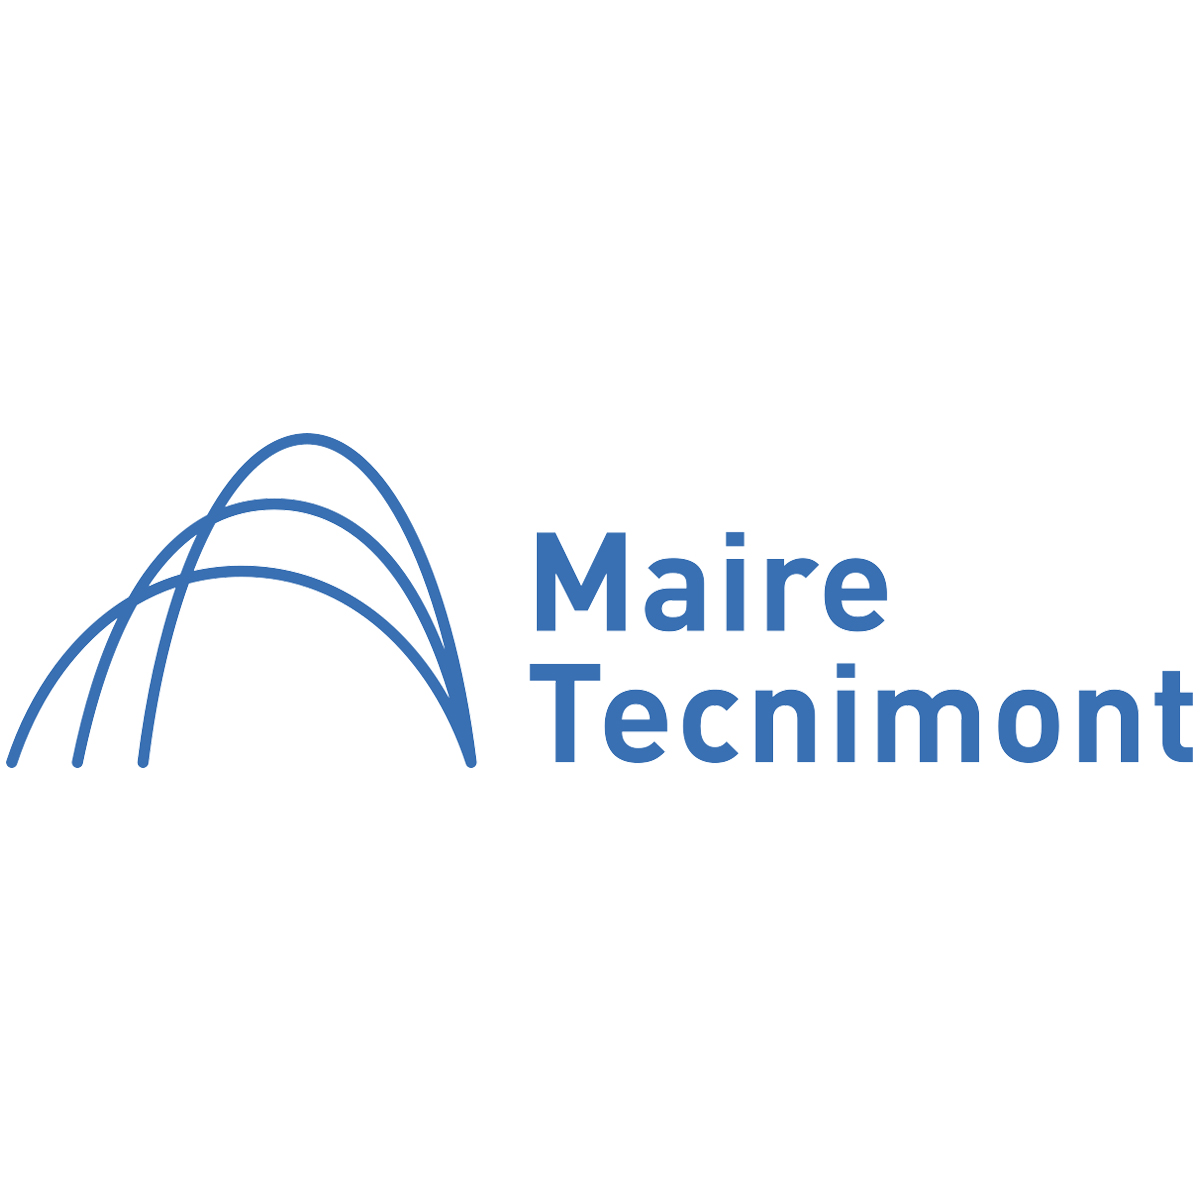 Maire Tecnimont: SCAM's Customer